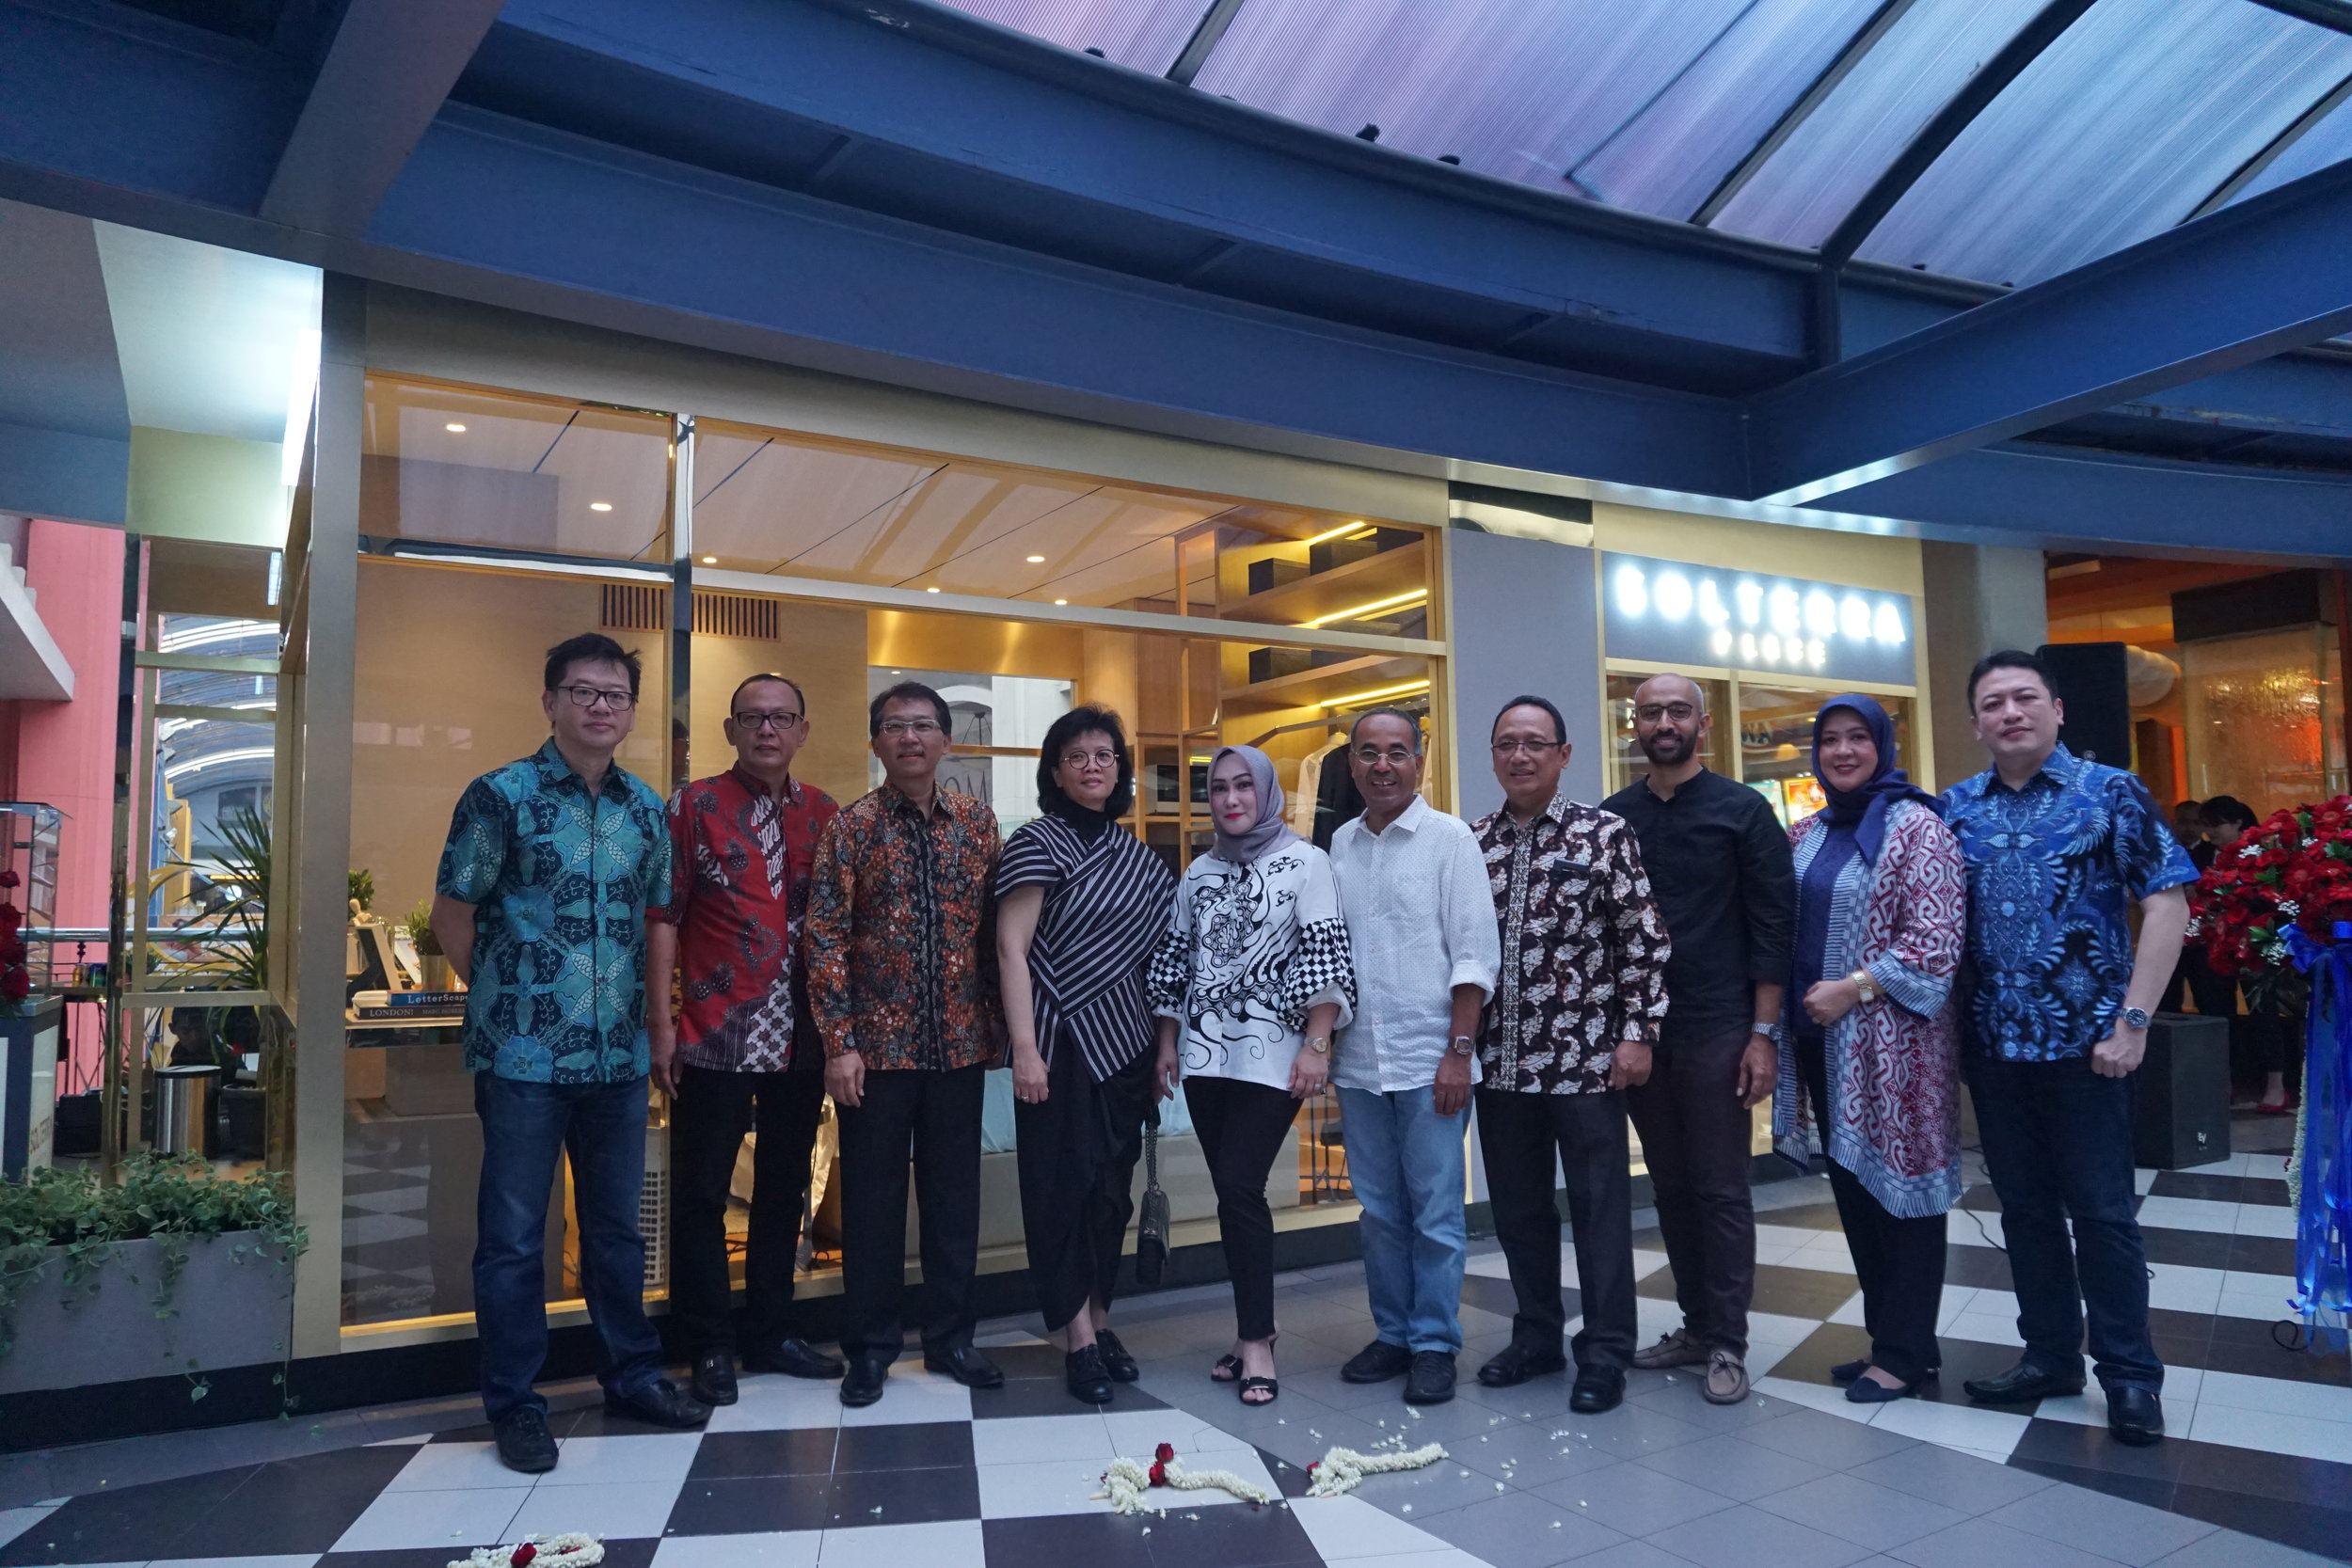 Cilandak Town Square menjadi pilihan tepat karena menjadi salah satu ruang publik yang ramai dikunjungi oleh berbagai kalangan. Sehingga sangat cocok membuka peluang besar bagi Solterra Place memperkenalkan show unit tower 2 Vasaka Suites secara luas kepada khalayak. Selain itu, show unit tower 2 Vasaka Suites ini dapat menciptakan daya tarik tersendiri di sela-sela salah satu pusat hiburan di Jakarta Selatan tersebut. Solterra Place sendiri merupakan proyek bergengsi yang dikembangkan oleh PT Waskita FIM Perkasa Realti. Setelah di tahun 2018 berhasil memasarkan tower 1 Vasaka Residence, yang terjual mencapai angka 90 persen hanya dalam kurun waktu 1 tahun membuat Solterra Place makin yakin bahwa peluncuran tower 2 Vasaka Suites pada pertengahan tahun 2019 akan diterima pasar dengan baik.  Melalui tagline Your Place, Your Life, Solterra Place dirancang ramah lingkungan dengan mengintegerasikan penghijauan dan gaya hidup kelas atas. Konsep Ruang Terbuka Hijau juga akan diwujudkan melalui Sanctum Garden, sebuah taman luas dan area bersantai yang sejuk dan rindang untuk para penghuninya. Momentum ini dimanfaatkan oleh perusahaan dalam menggebrak pasar properti nasional dengan memasarkan tower ke-2 dari Solterra Place, yaitu Vasaka Suites. Tipe show unit dari tower 2 Vasaka Suites yang dipamerkan kali ini mengusung konsep bergaya modern, young, dan luxurious. Menonjolkan Warna-warna lembut dan elegan seperti pastel, gold dan sedikit sentuhan abu-abu banyak digunakan sebagai akses utama interior. Joko Herwanto selaku Direktur Utama PT Waskita Fim Perkasa Realti, dalam siaran pers hari ini mengungkapkan,